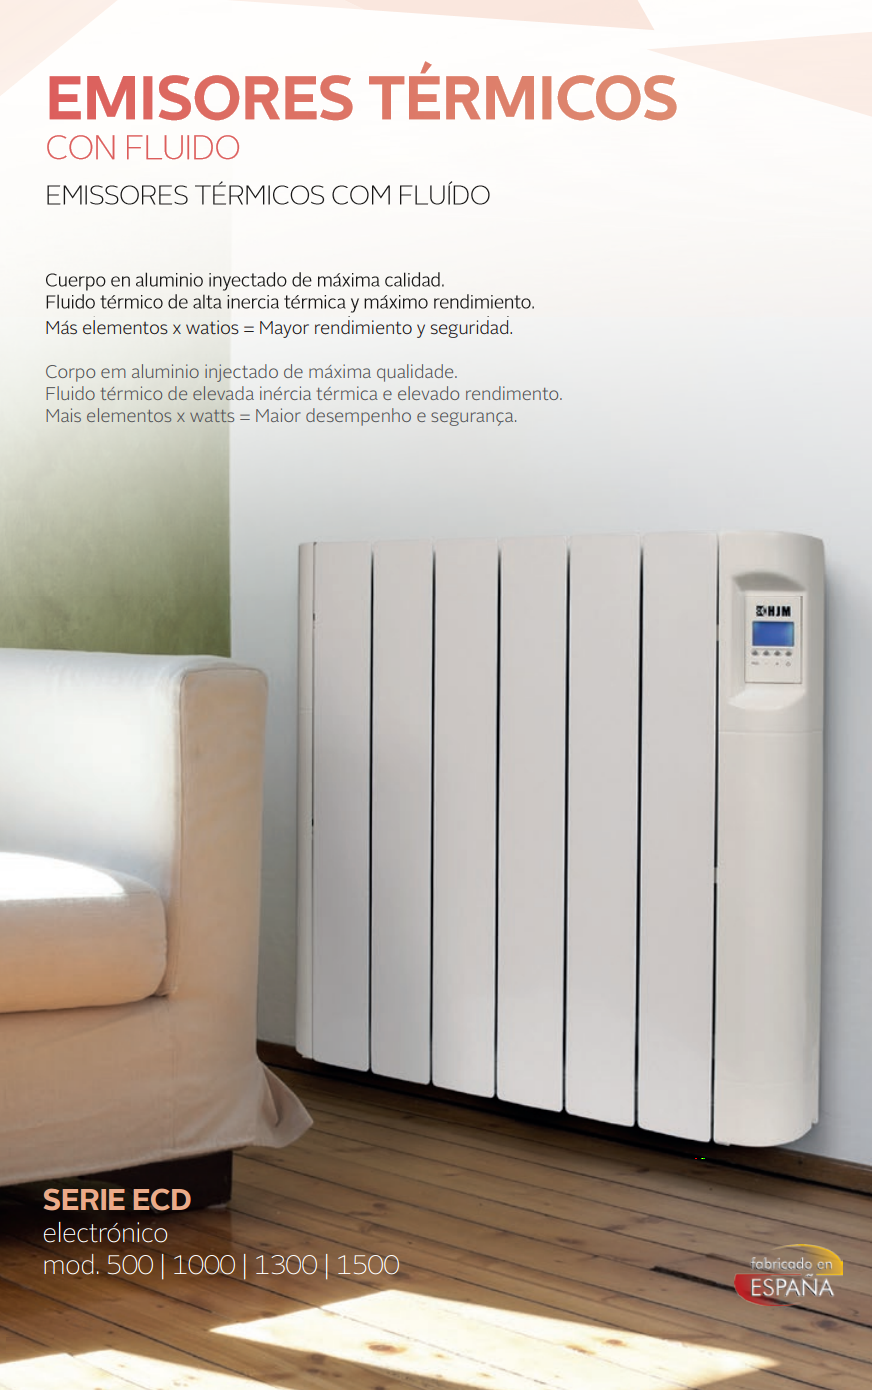 Emisor t rmico de bajo consumo hjm modelo ecd - Consumo emisores termicos ...